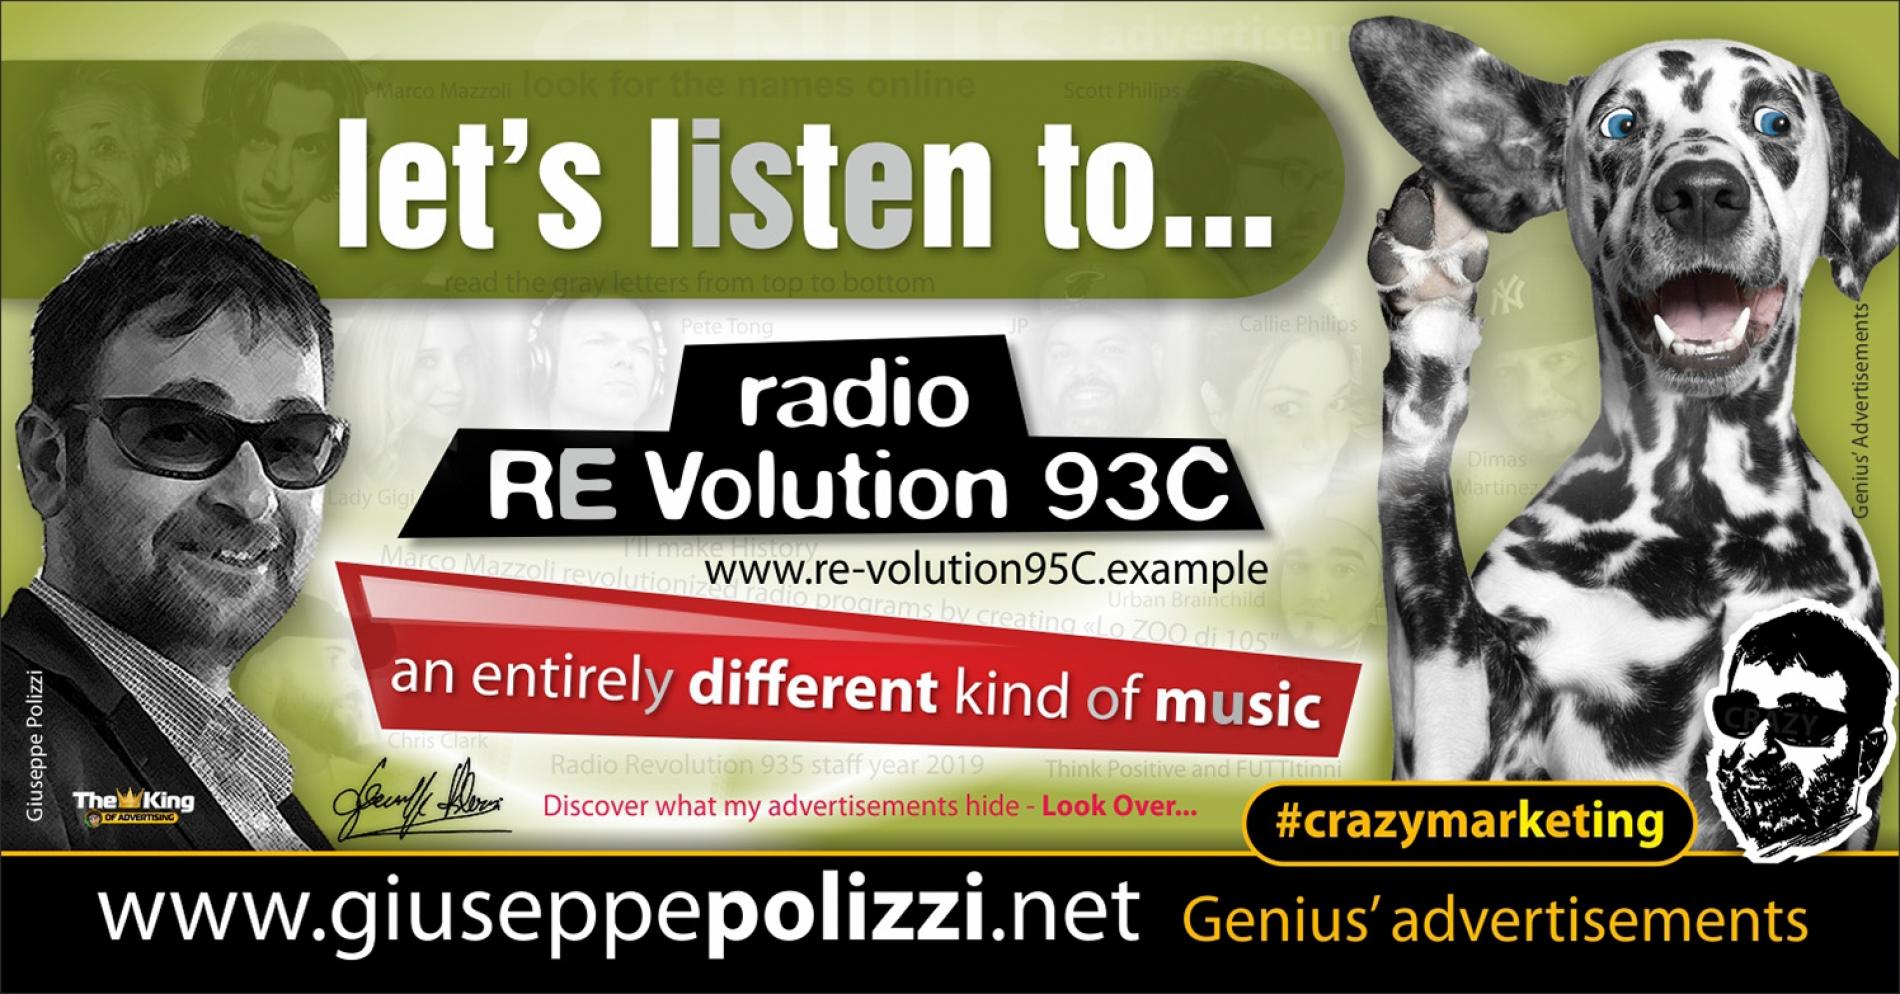 giuseppe polizzi crazymarketing Listen Radio RE VOLUTION advertising genius 2019